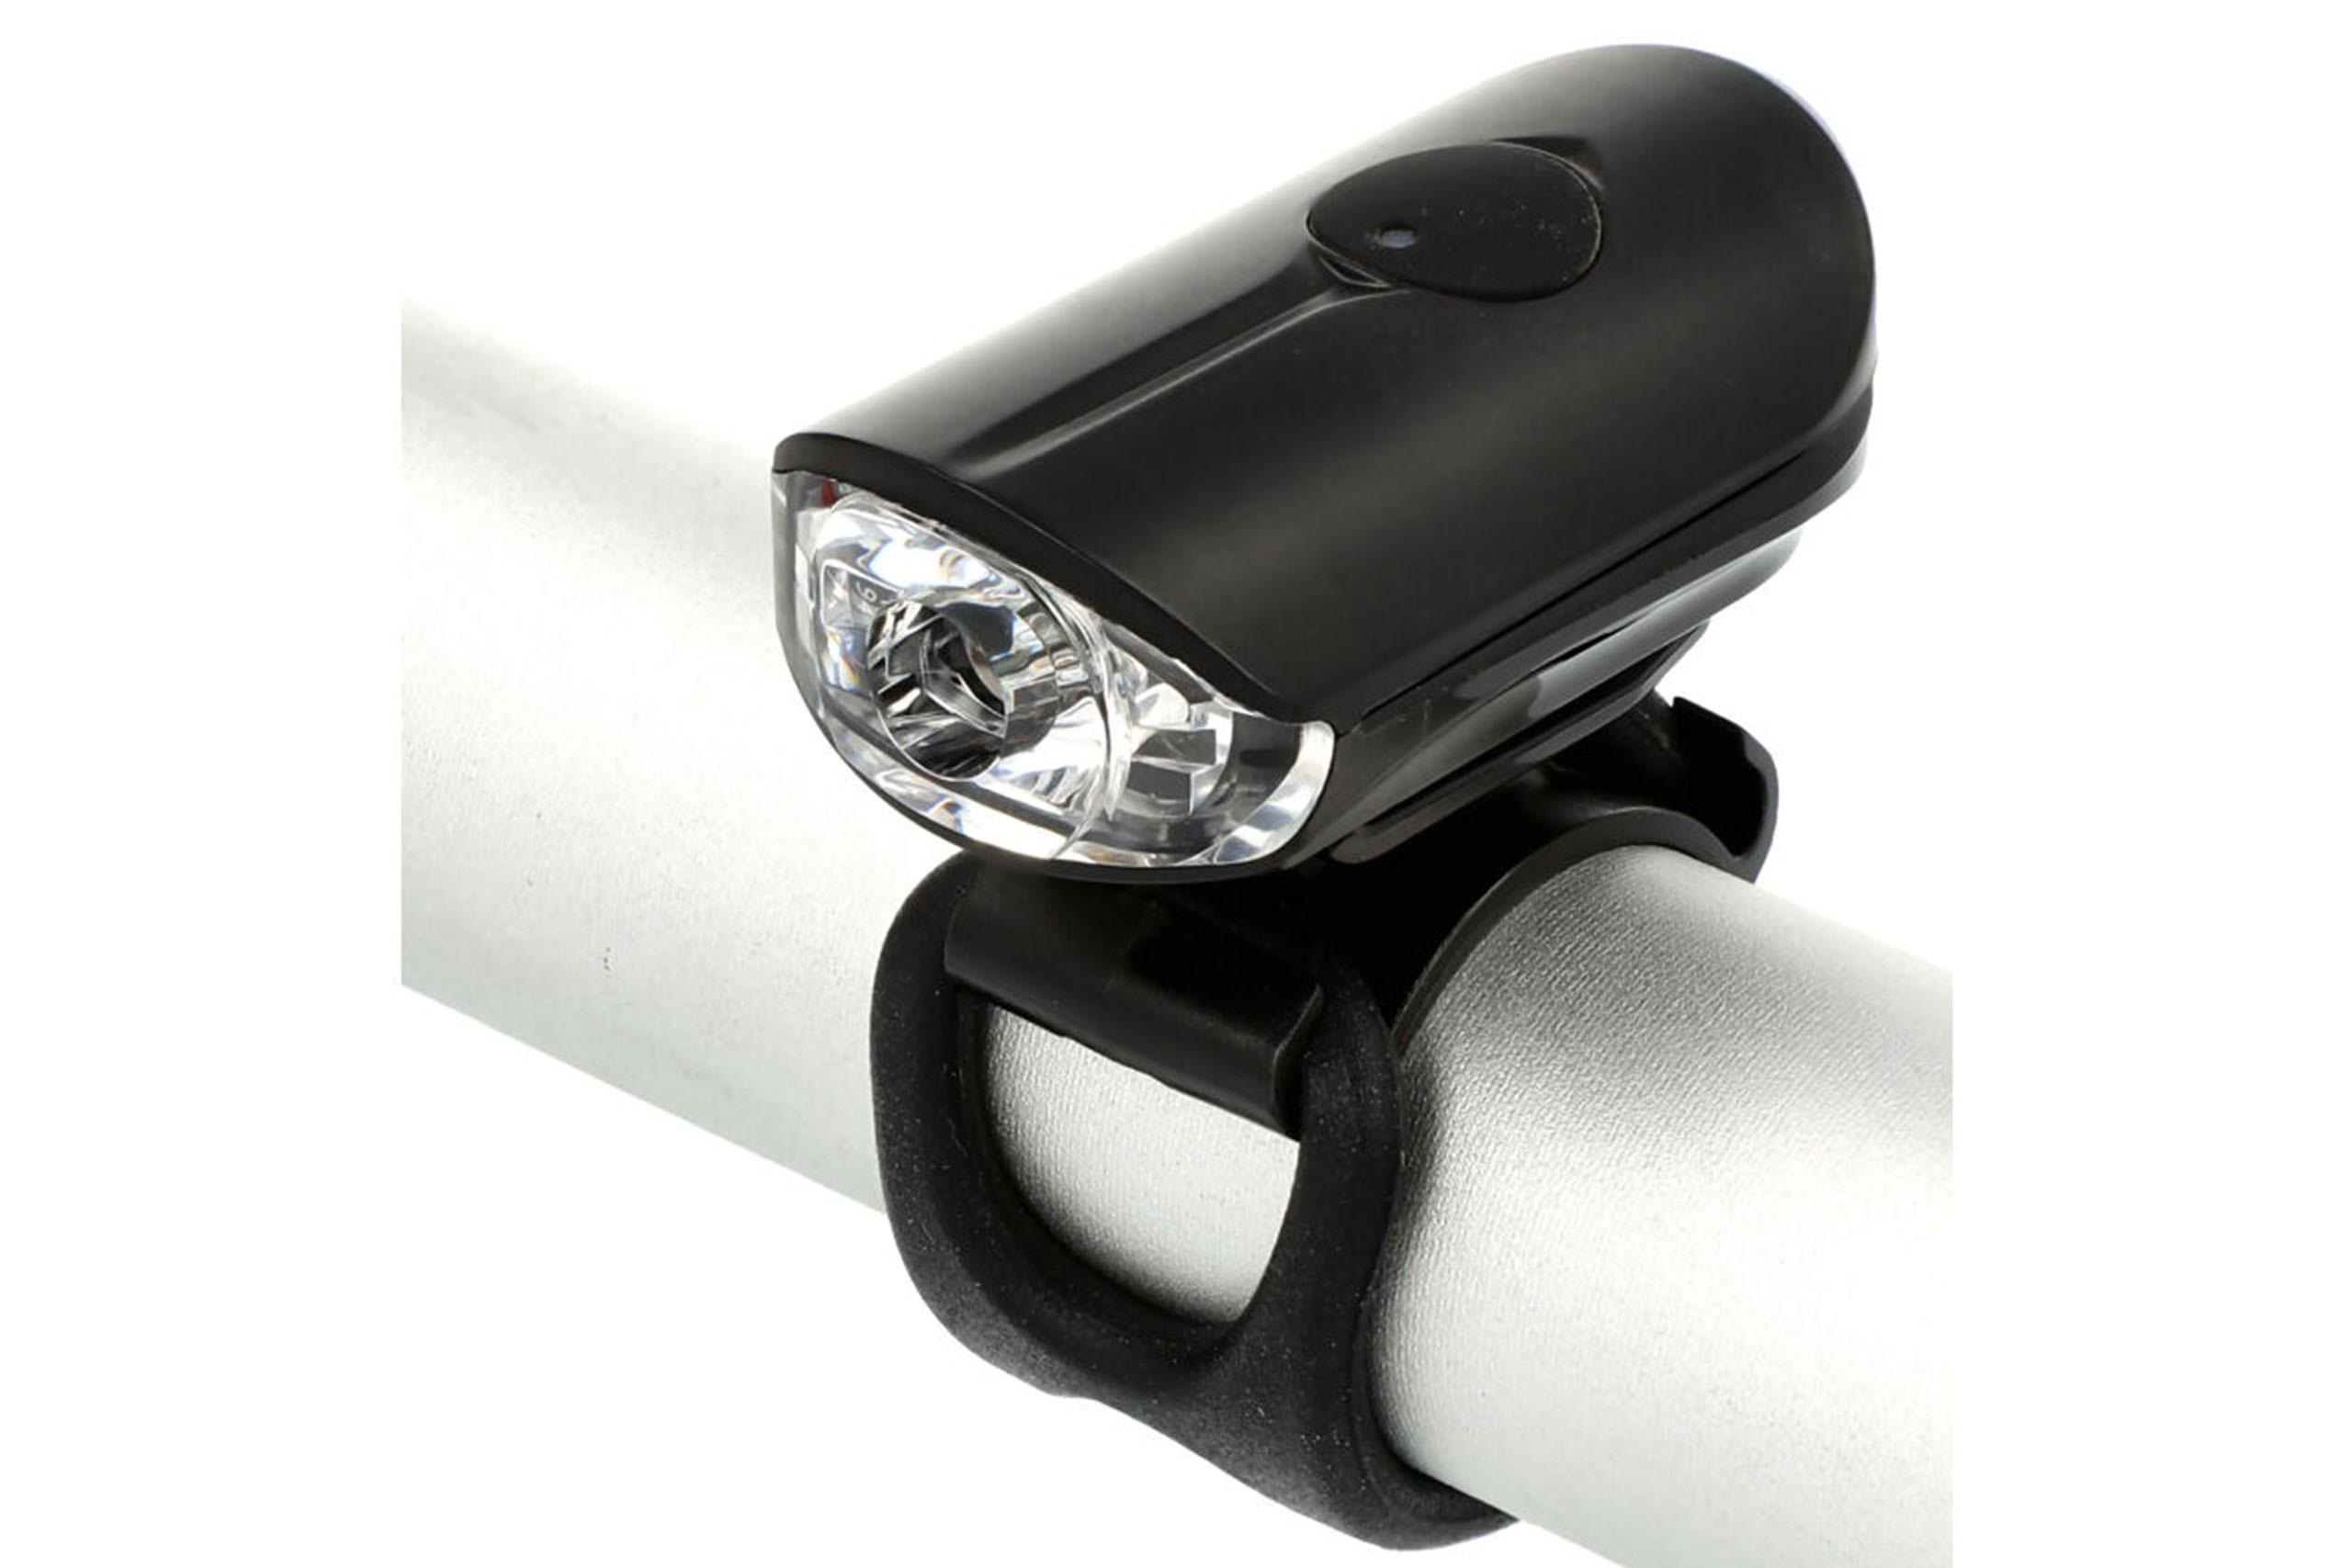 Lampa przednia /akumulator/ MERIDA USB czarna